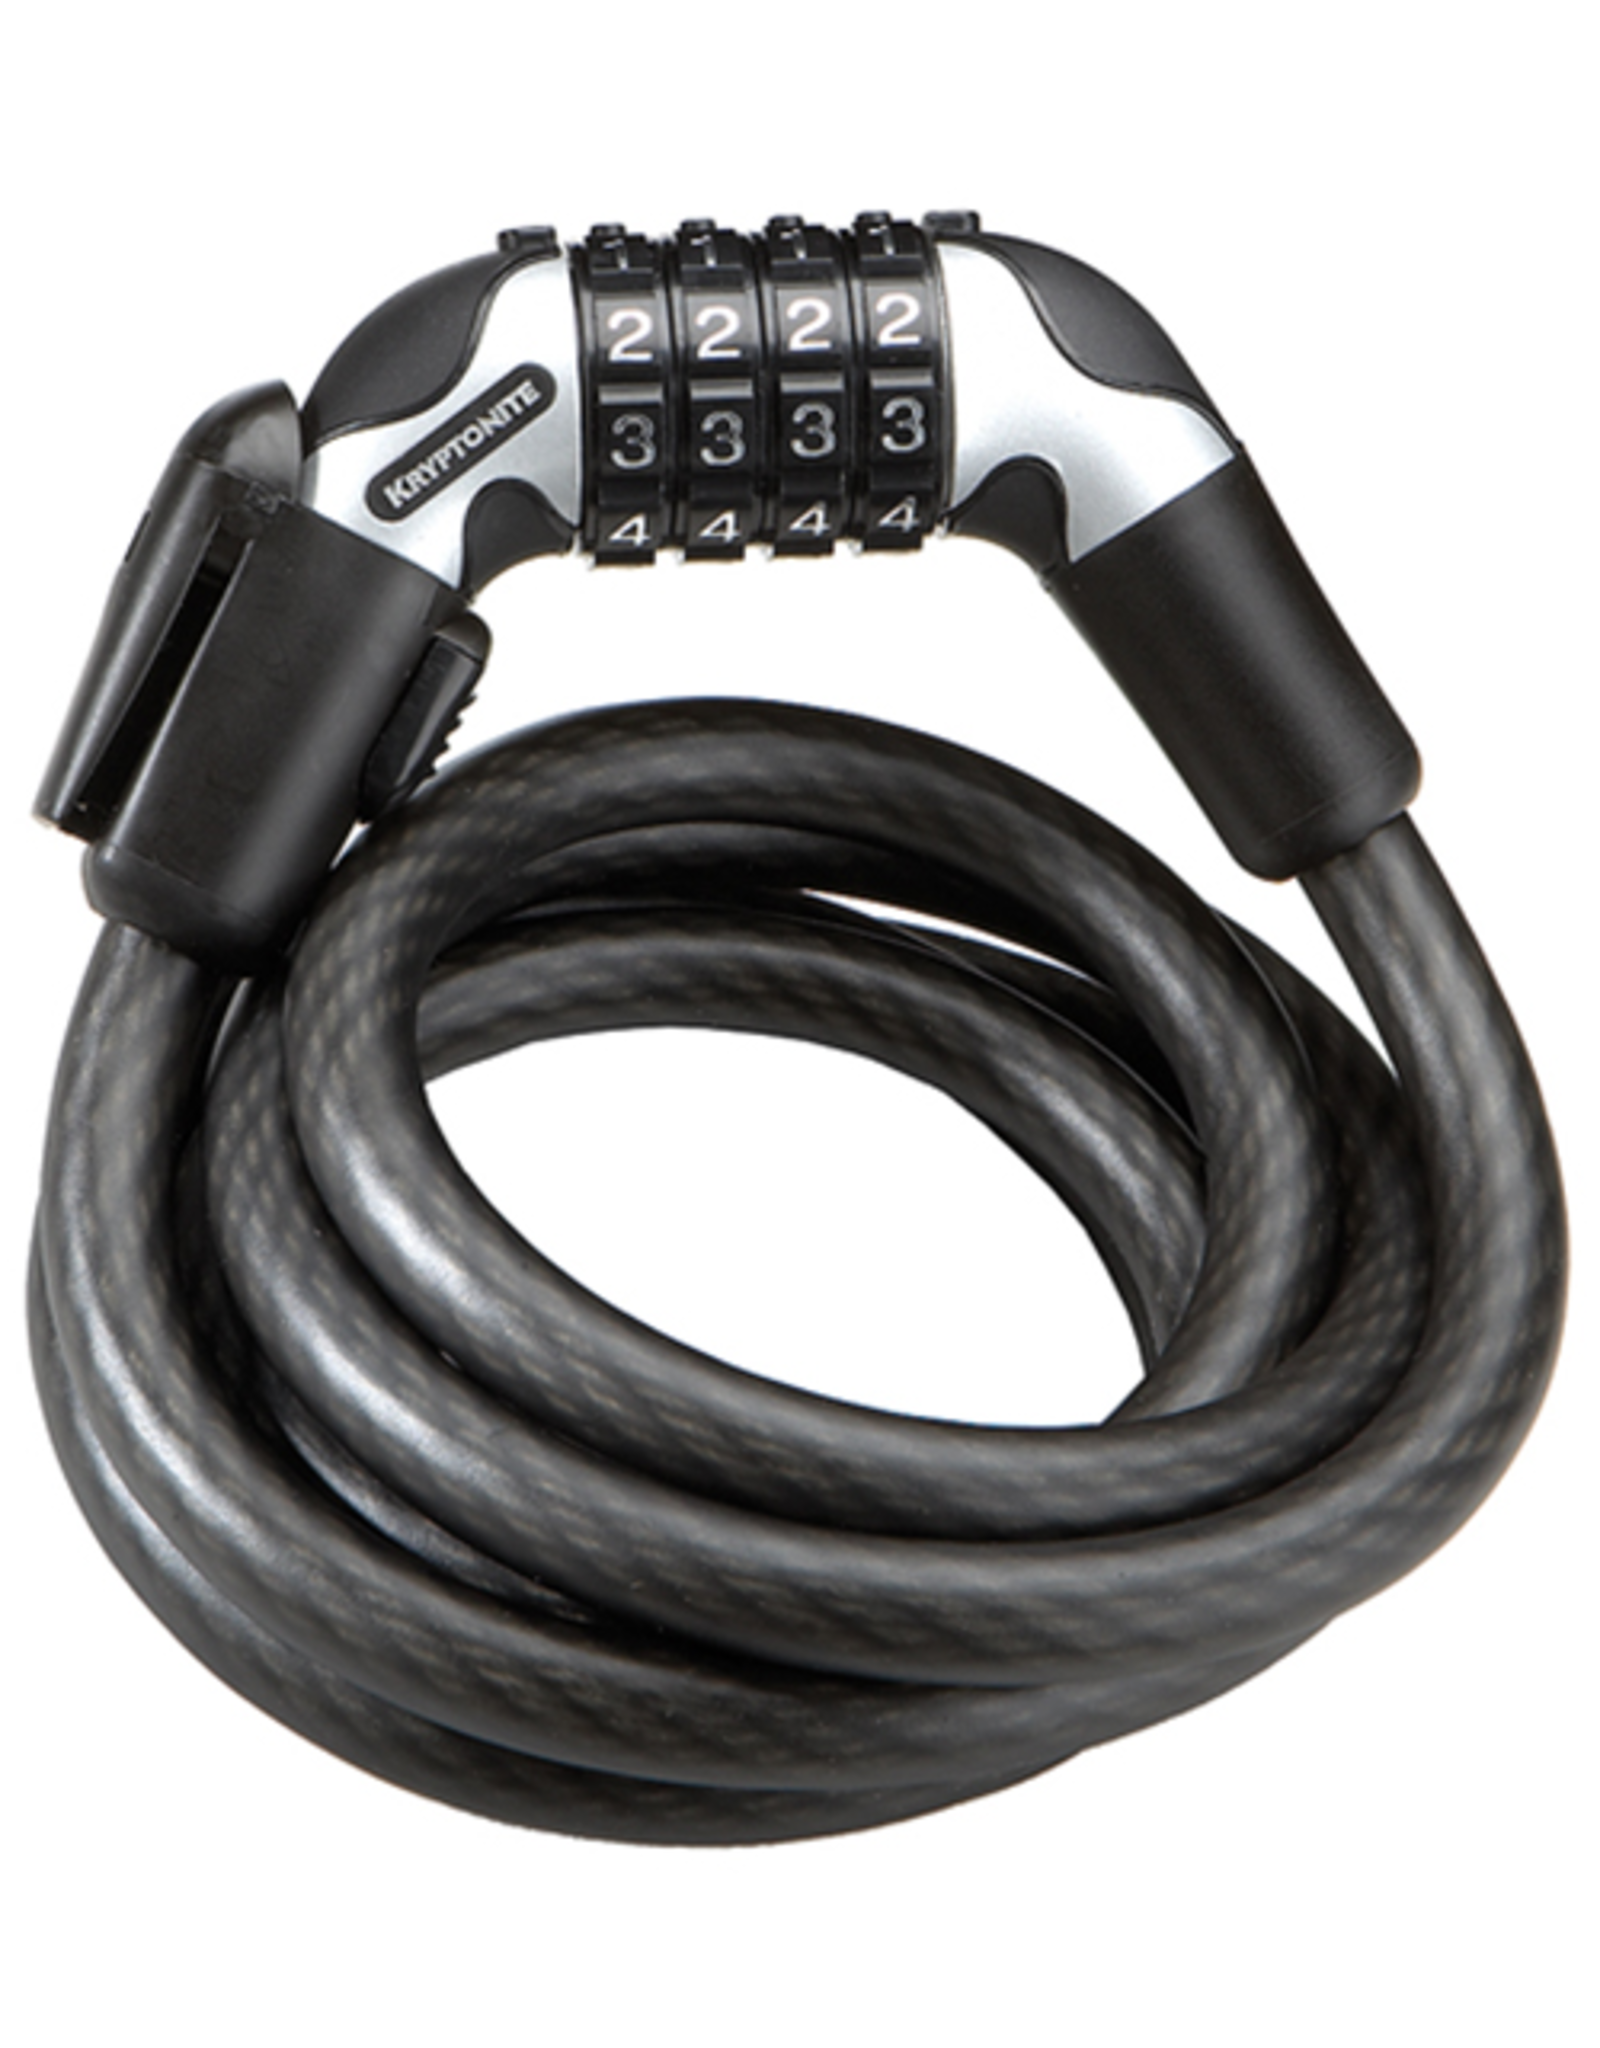 Kryptonite Cables Cadenas à combinaison Kryptonite Kryptoflex 1565